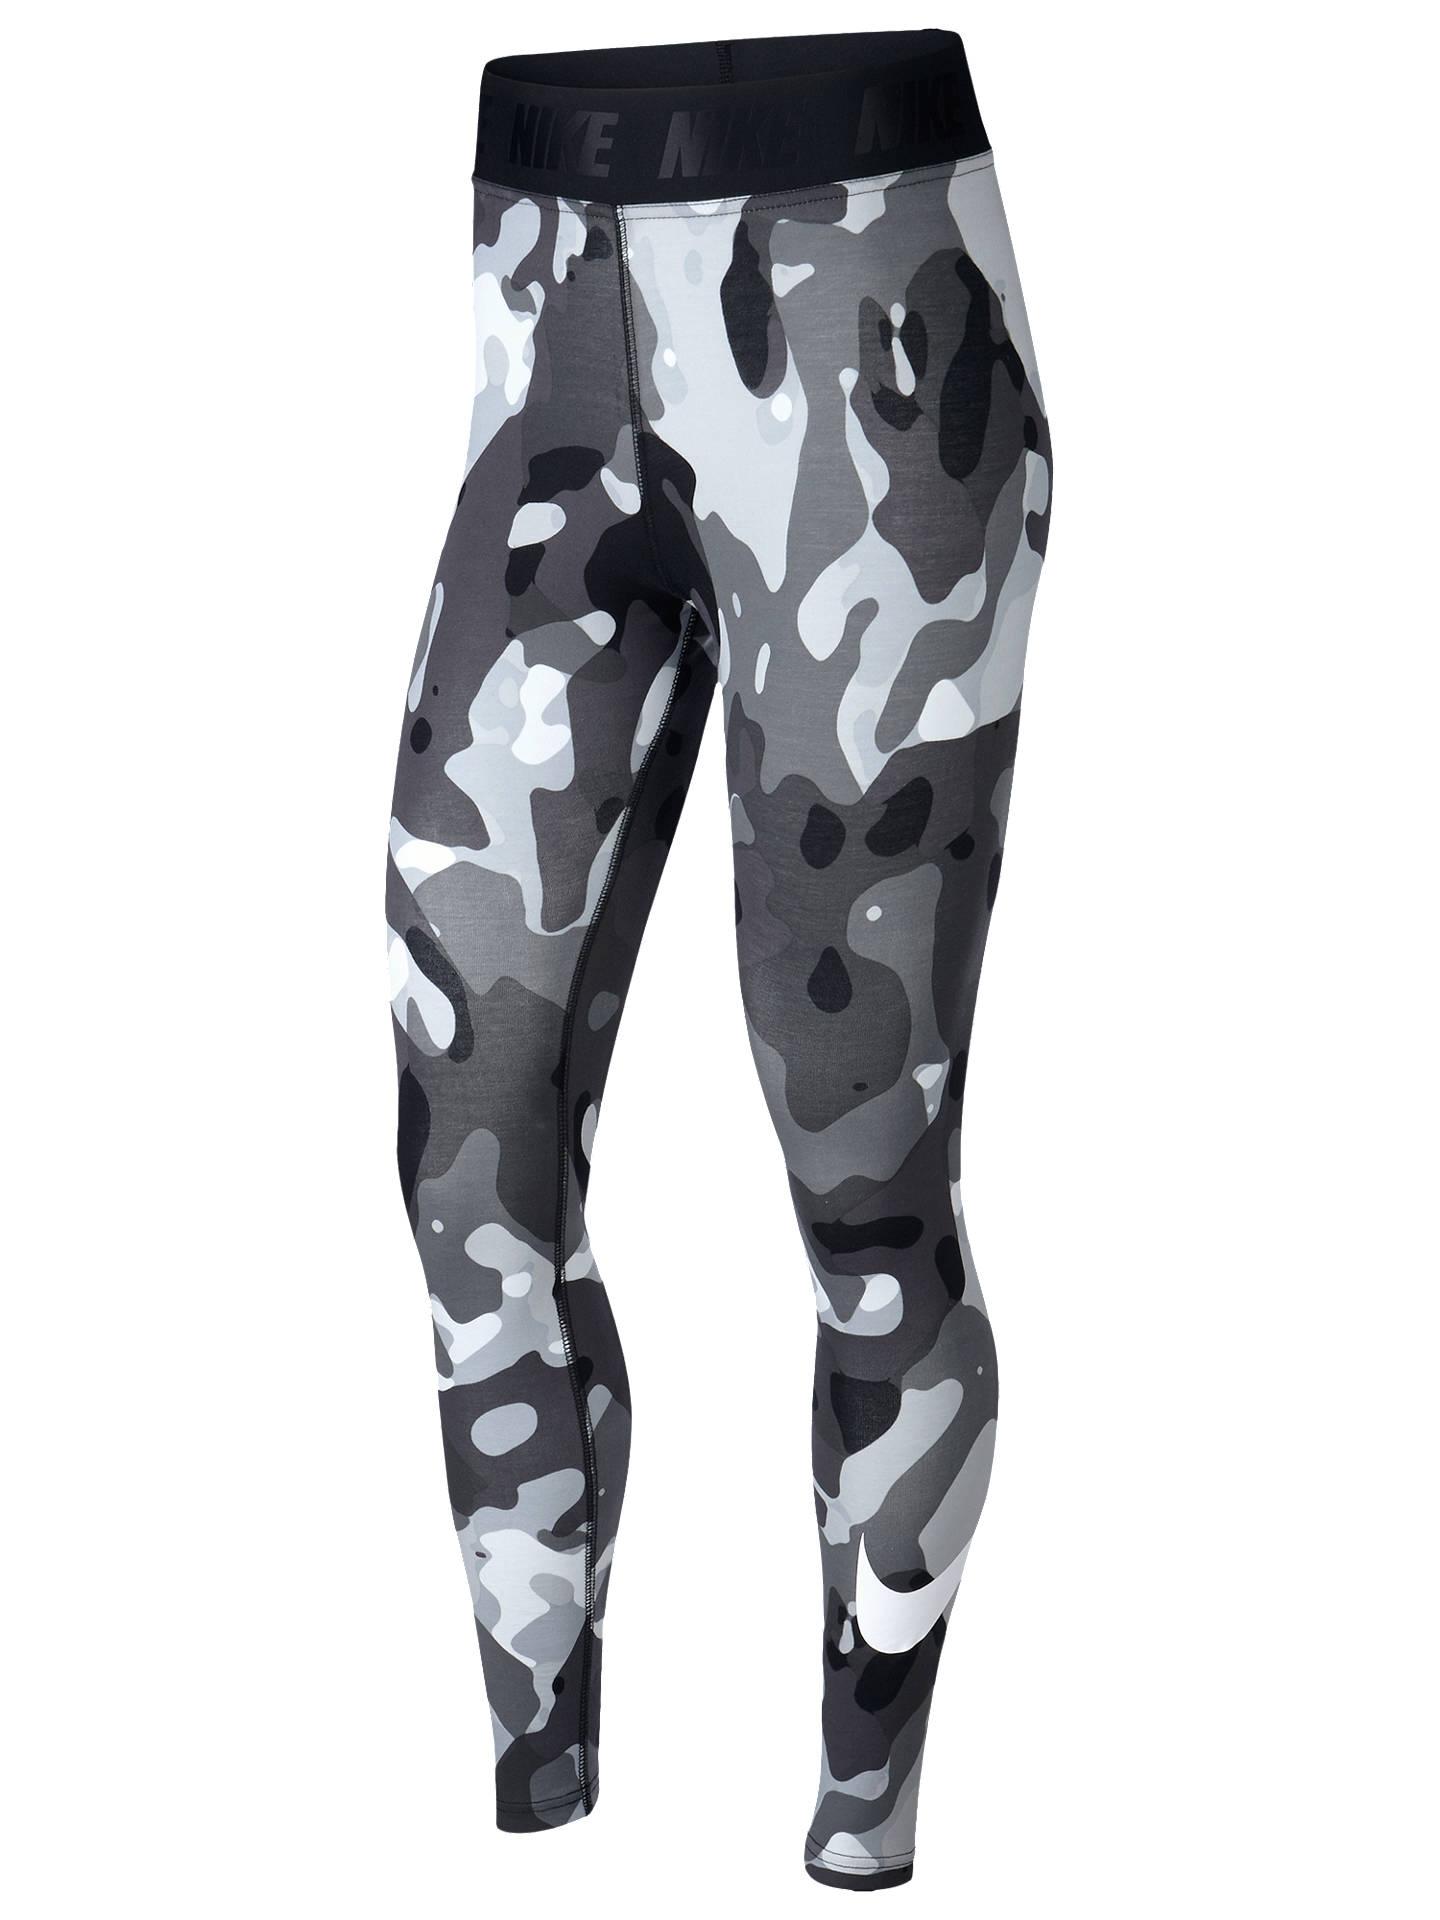 03af3e00331f33 Buy Nike Sportswear Swoosh Camo Training Tights, Black/White, XS Online at  johnlewis ...